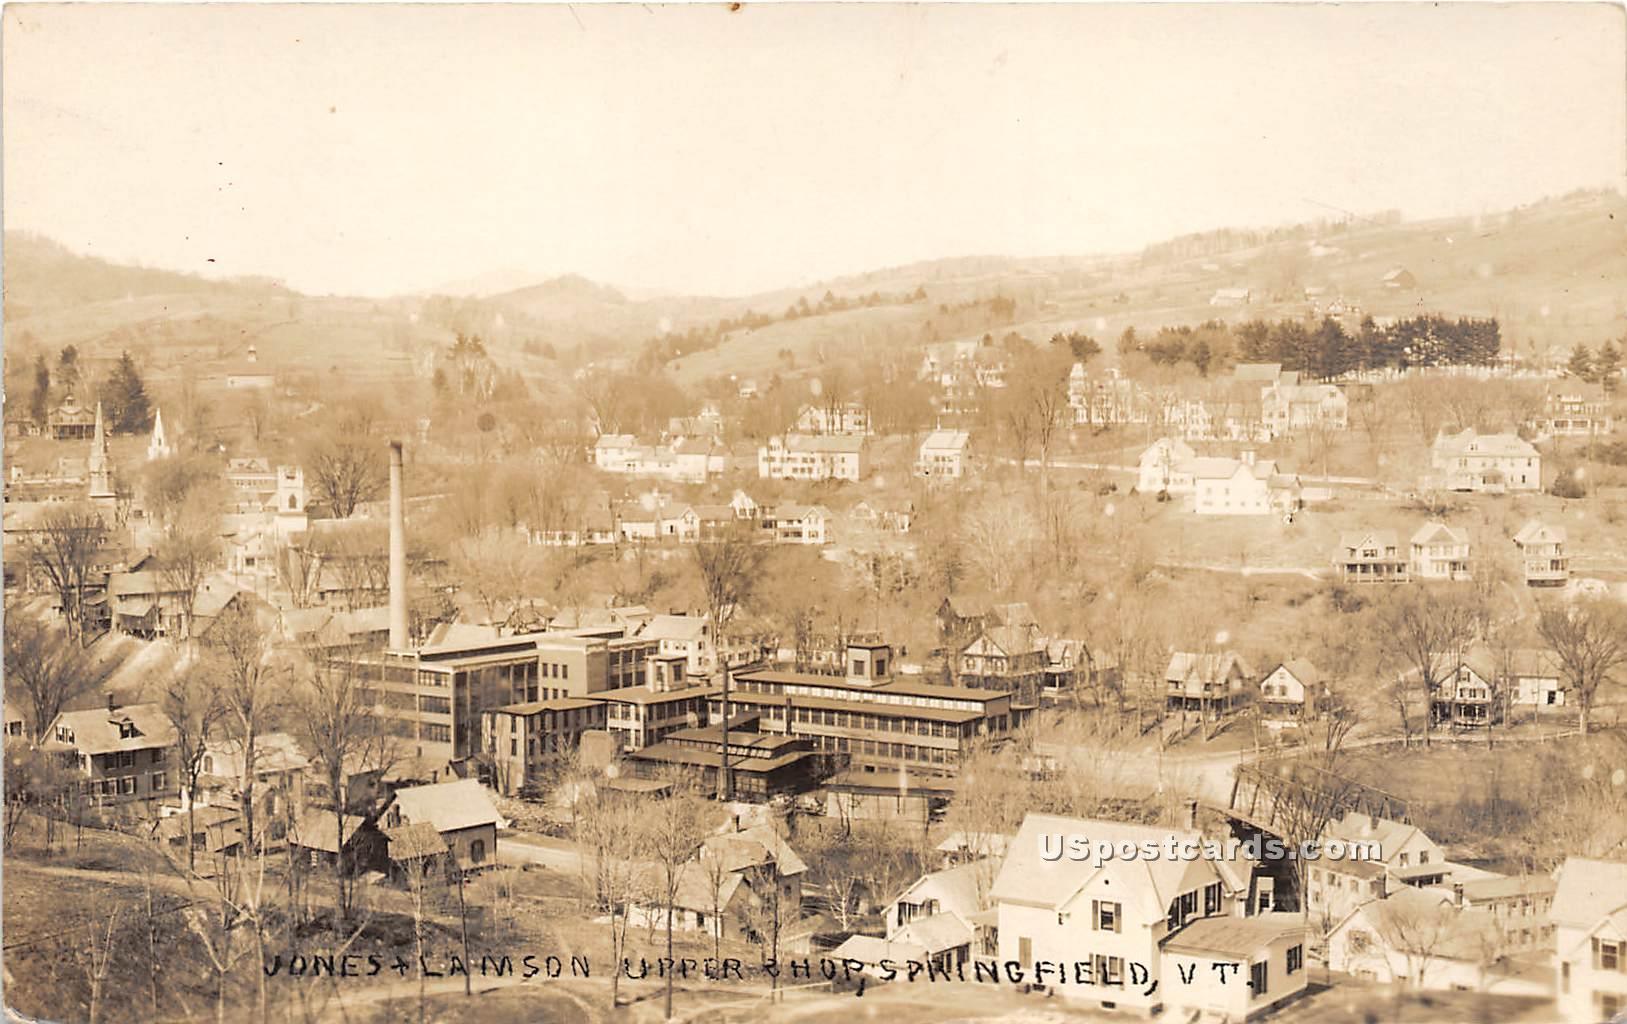 Jones & Camson Upper Shops - Springfield, Vermont VT Postcard